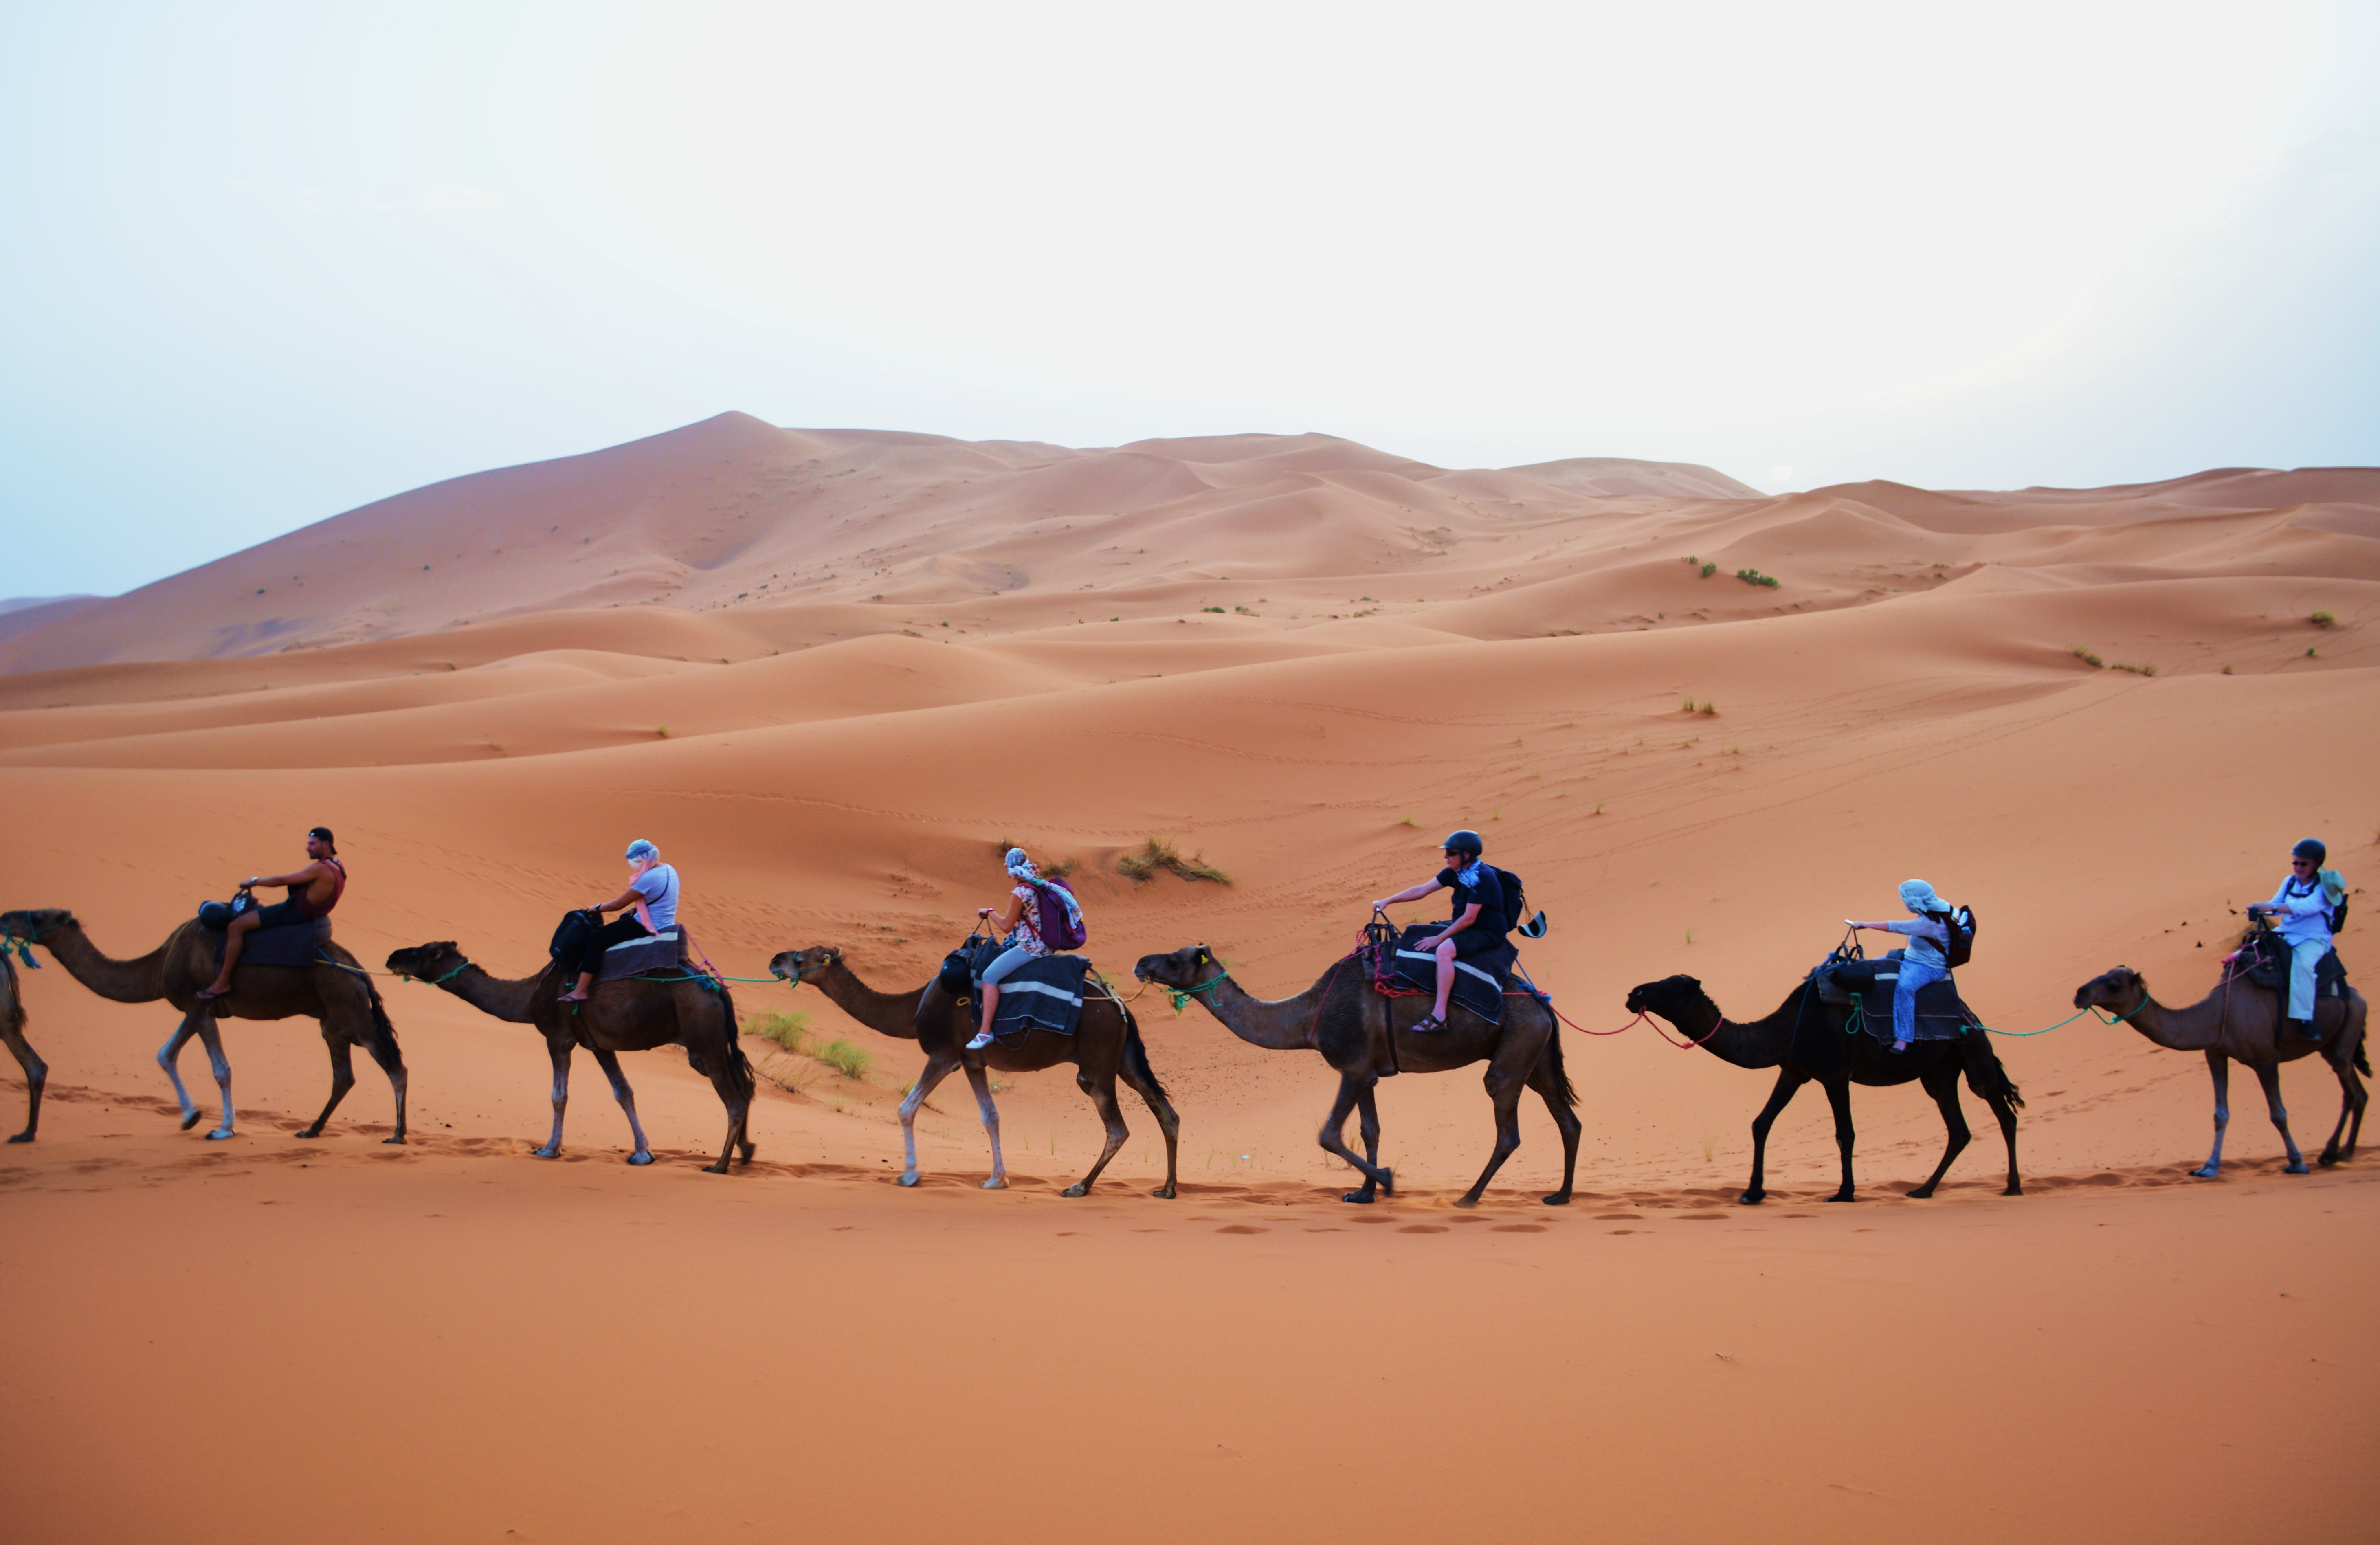 A Night Under The Stars In The Sahara Desert